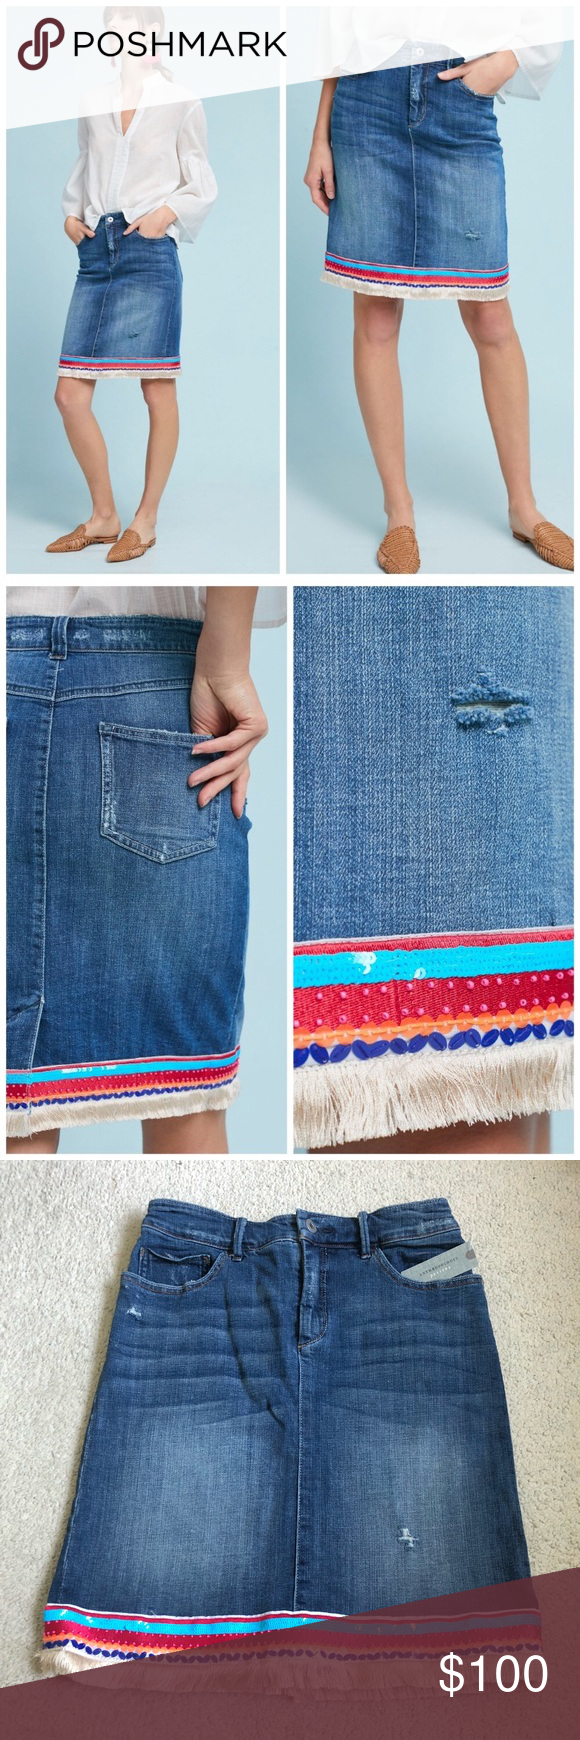 d892017229 Anthropologie Pilcro Beaded Trim Denim Skirt NWT 98% cotton, 2% spandex  Five-pocket styling Front zip Hand wash Imported Super adorable,  embellished hem ...